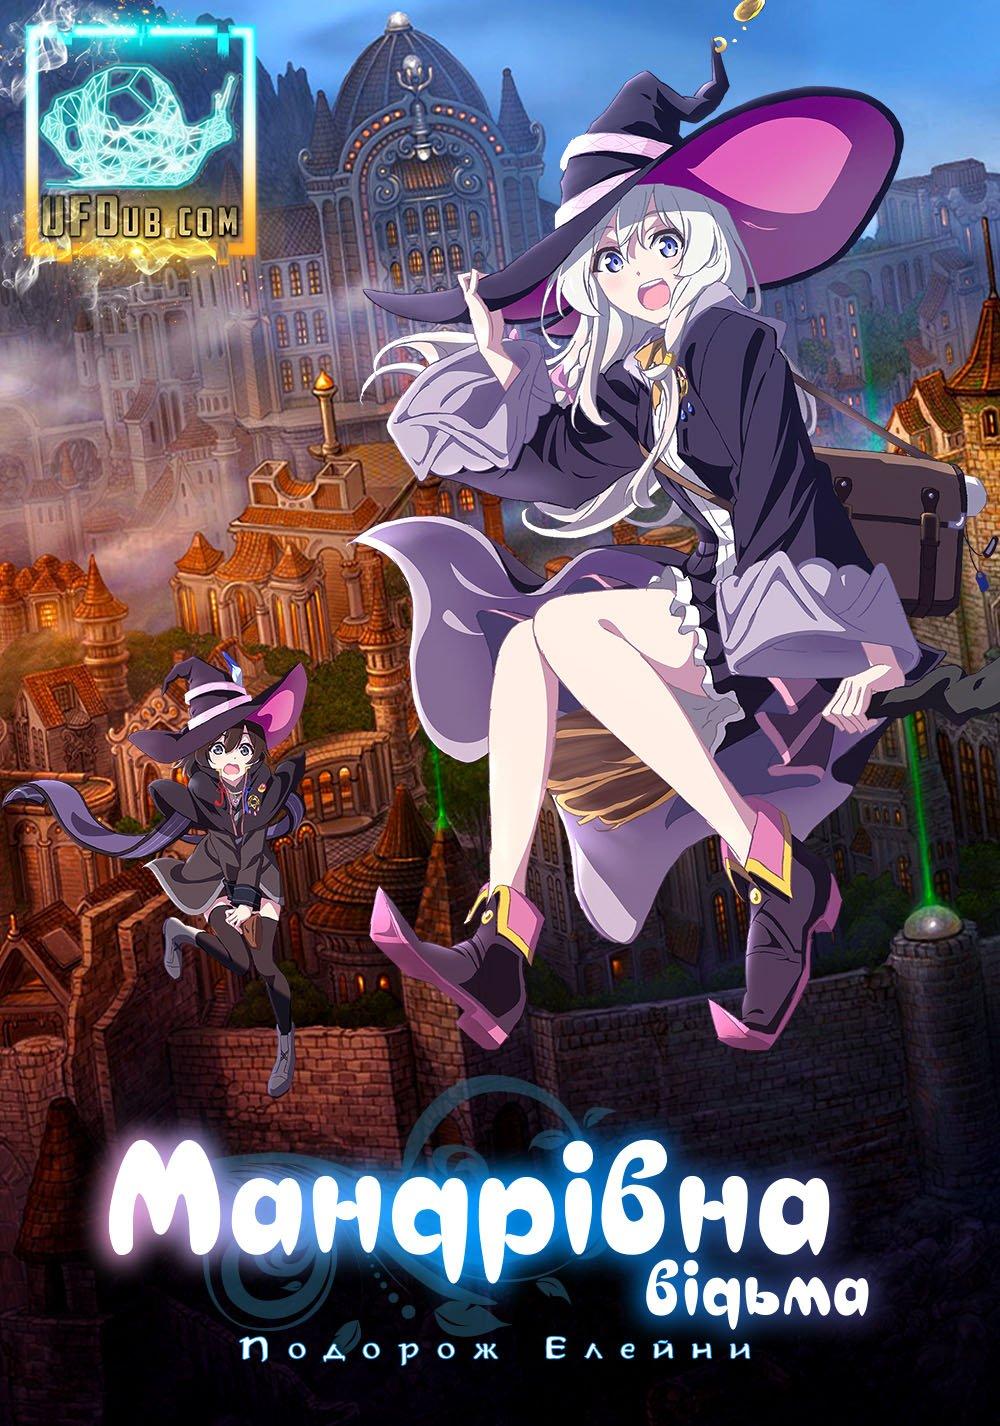 Мандрівна Відьма: Подорож Елайни / Majo no Tabitabi / Wandering Witch: The Journey of Elaina[3/12+]